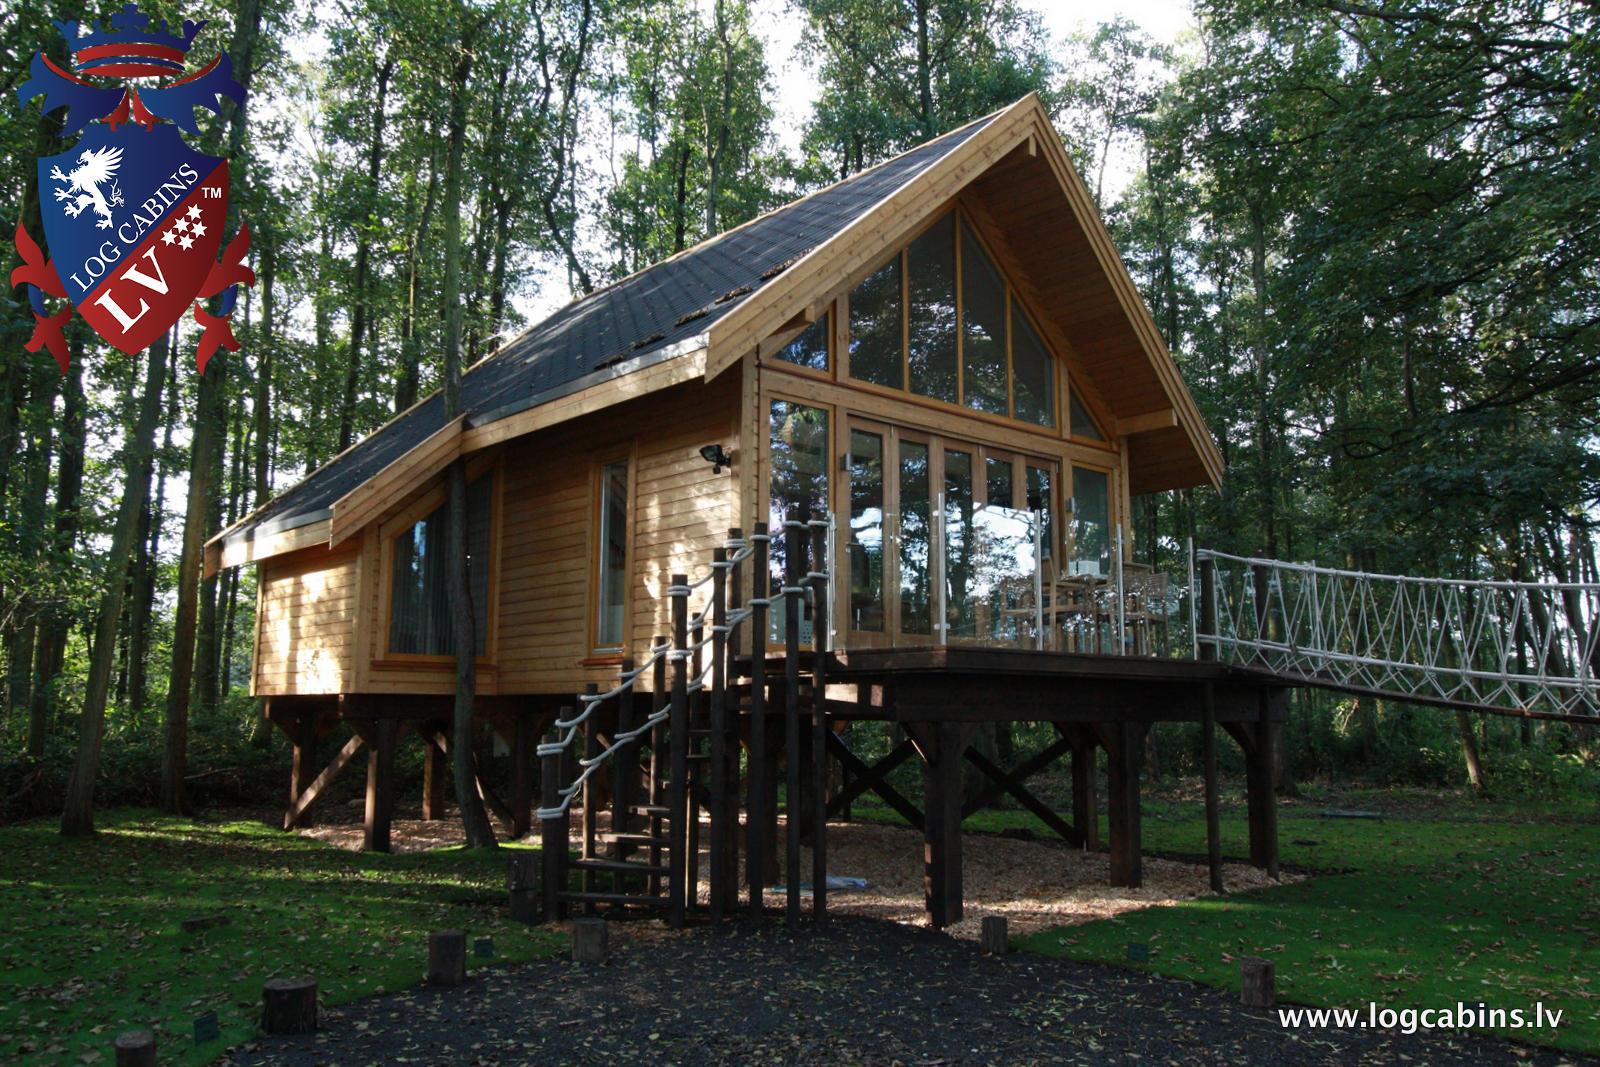 Hardwood Log Cabins ~ Timber buildings by log cabins lv